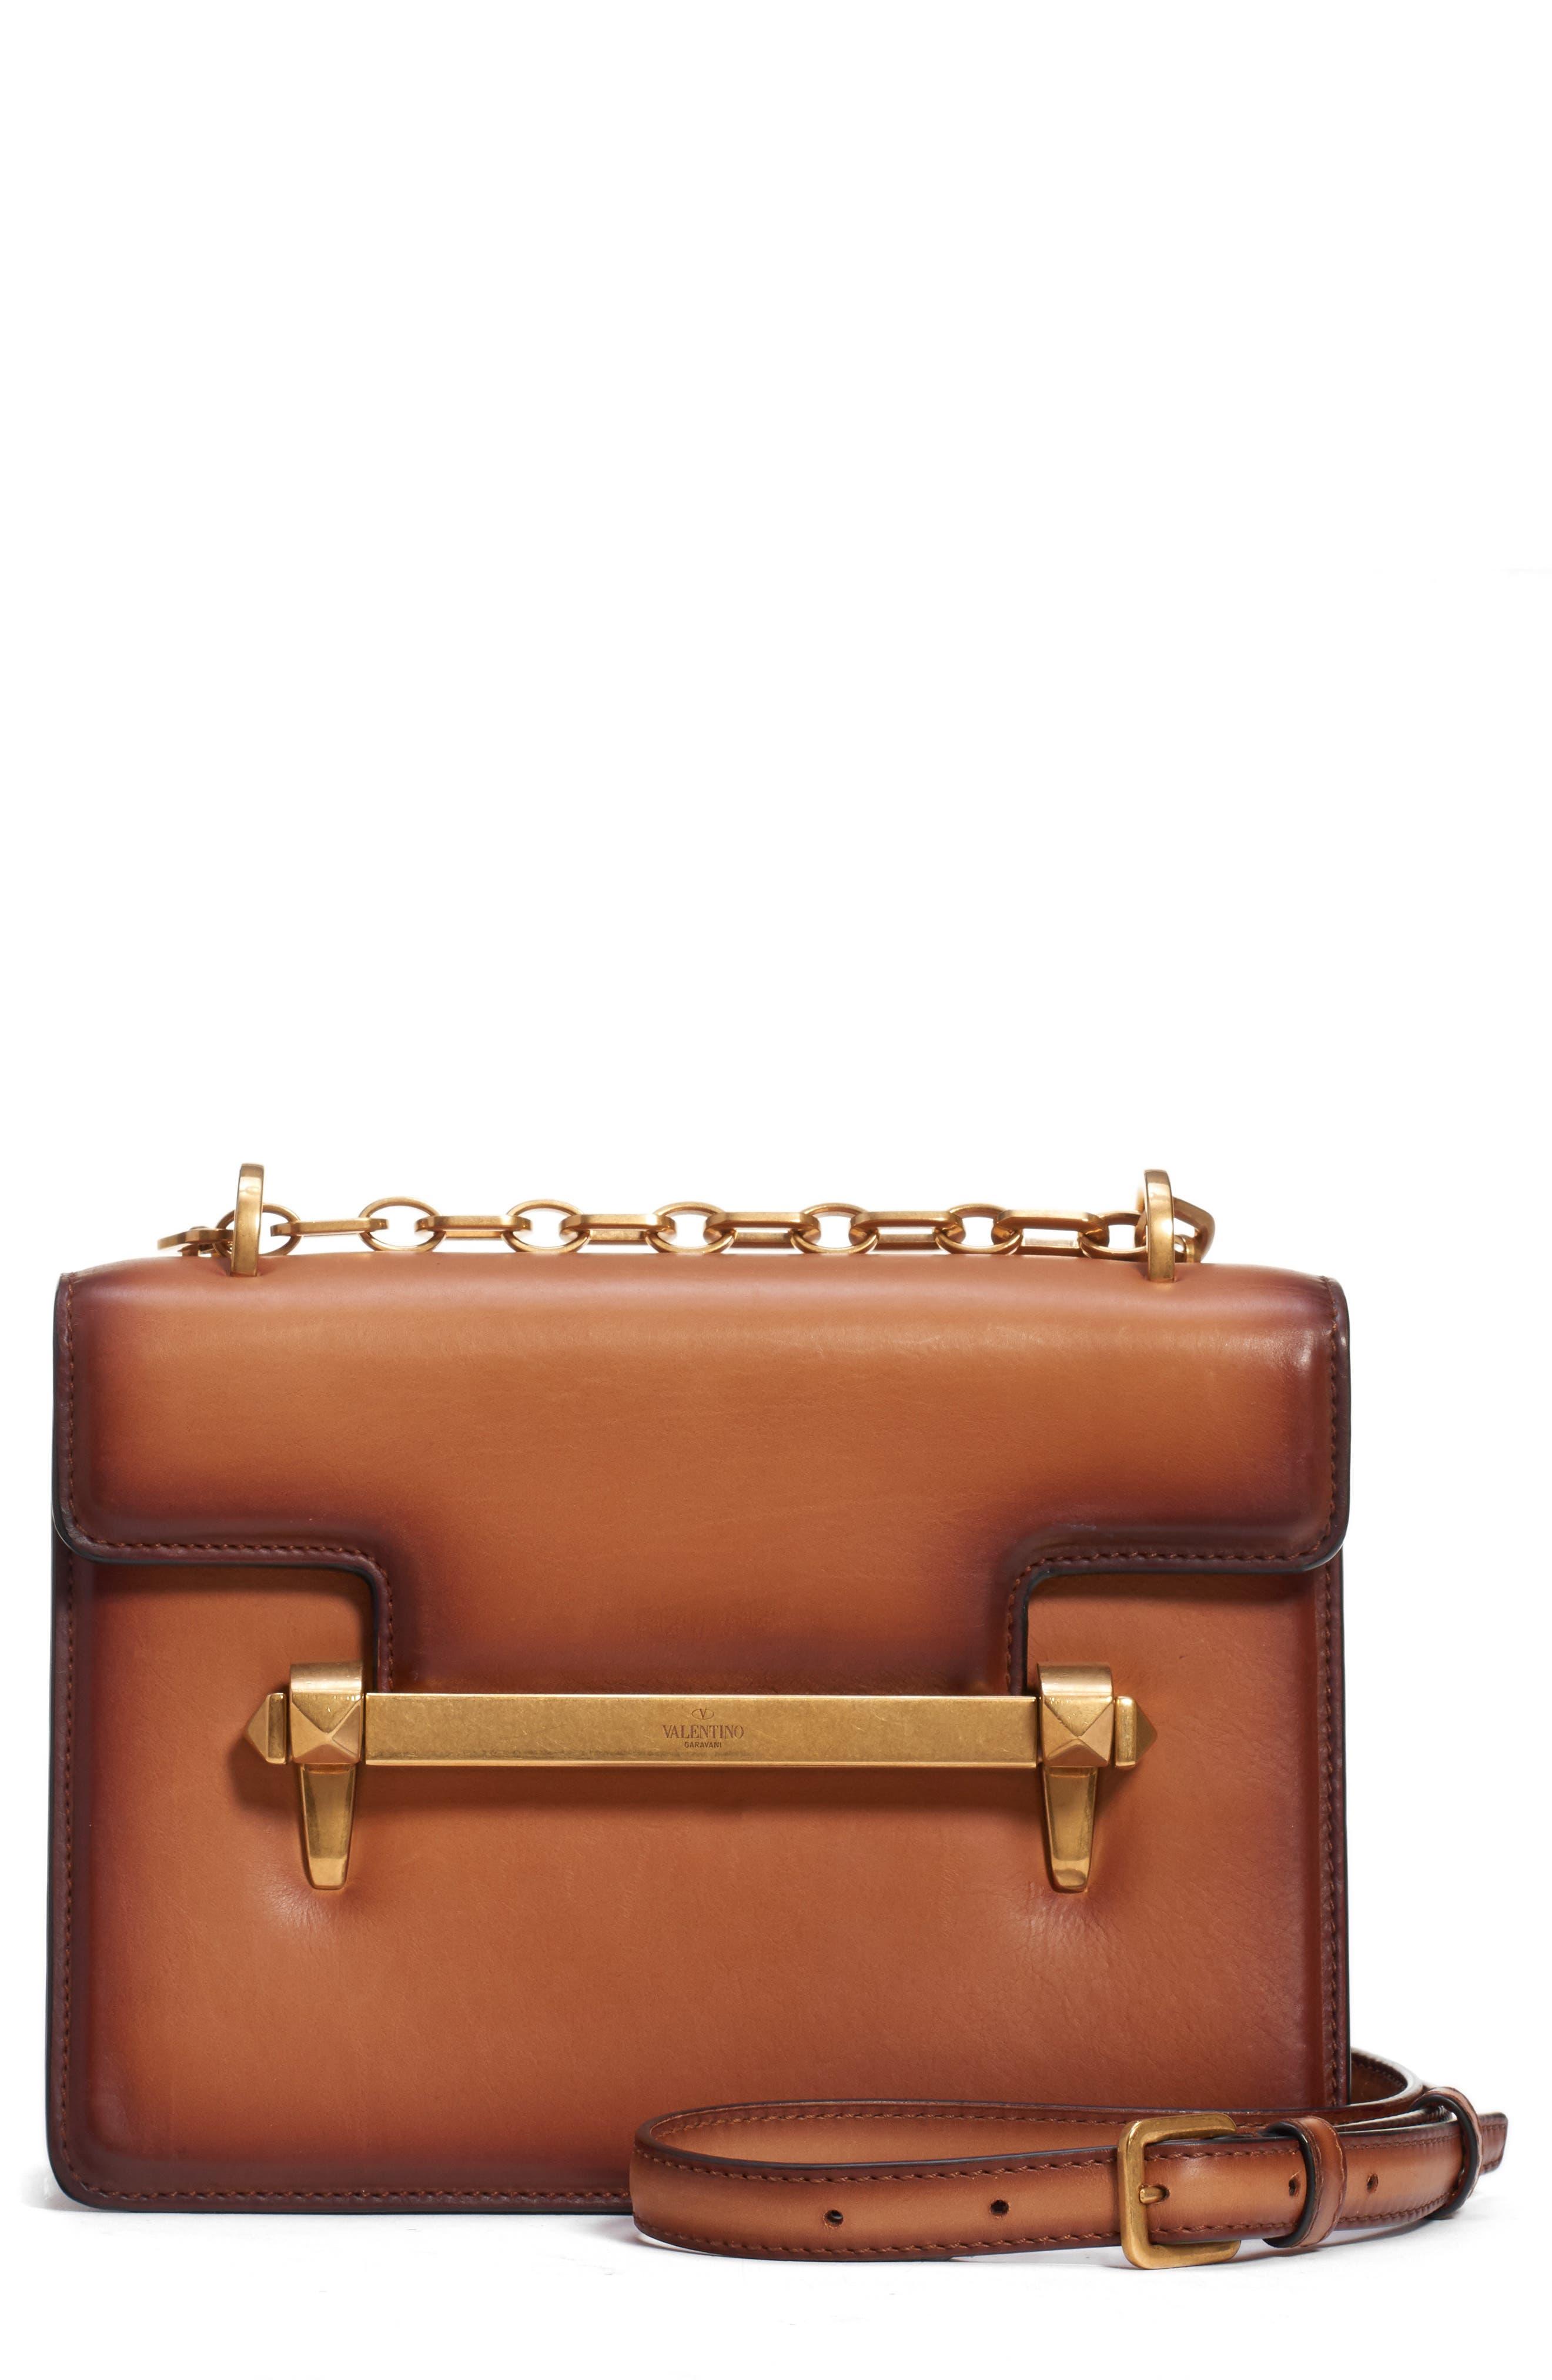 VALENTINO GARAVANI,                             Small Uptown Leather Shoulder Bag,                             Main thumbnail 1, color,                             BRIGHT COGNAC